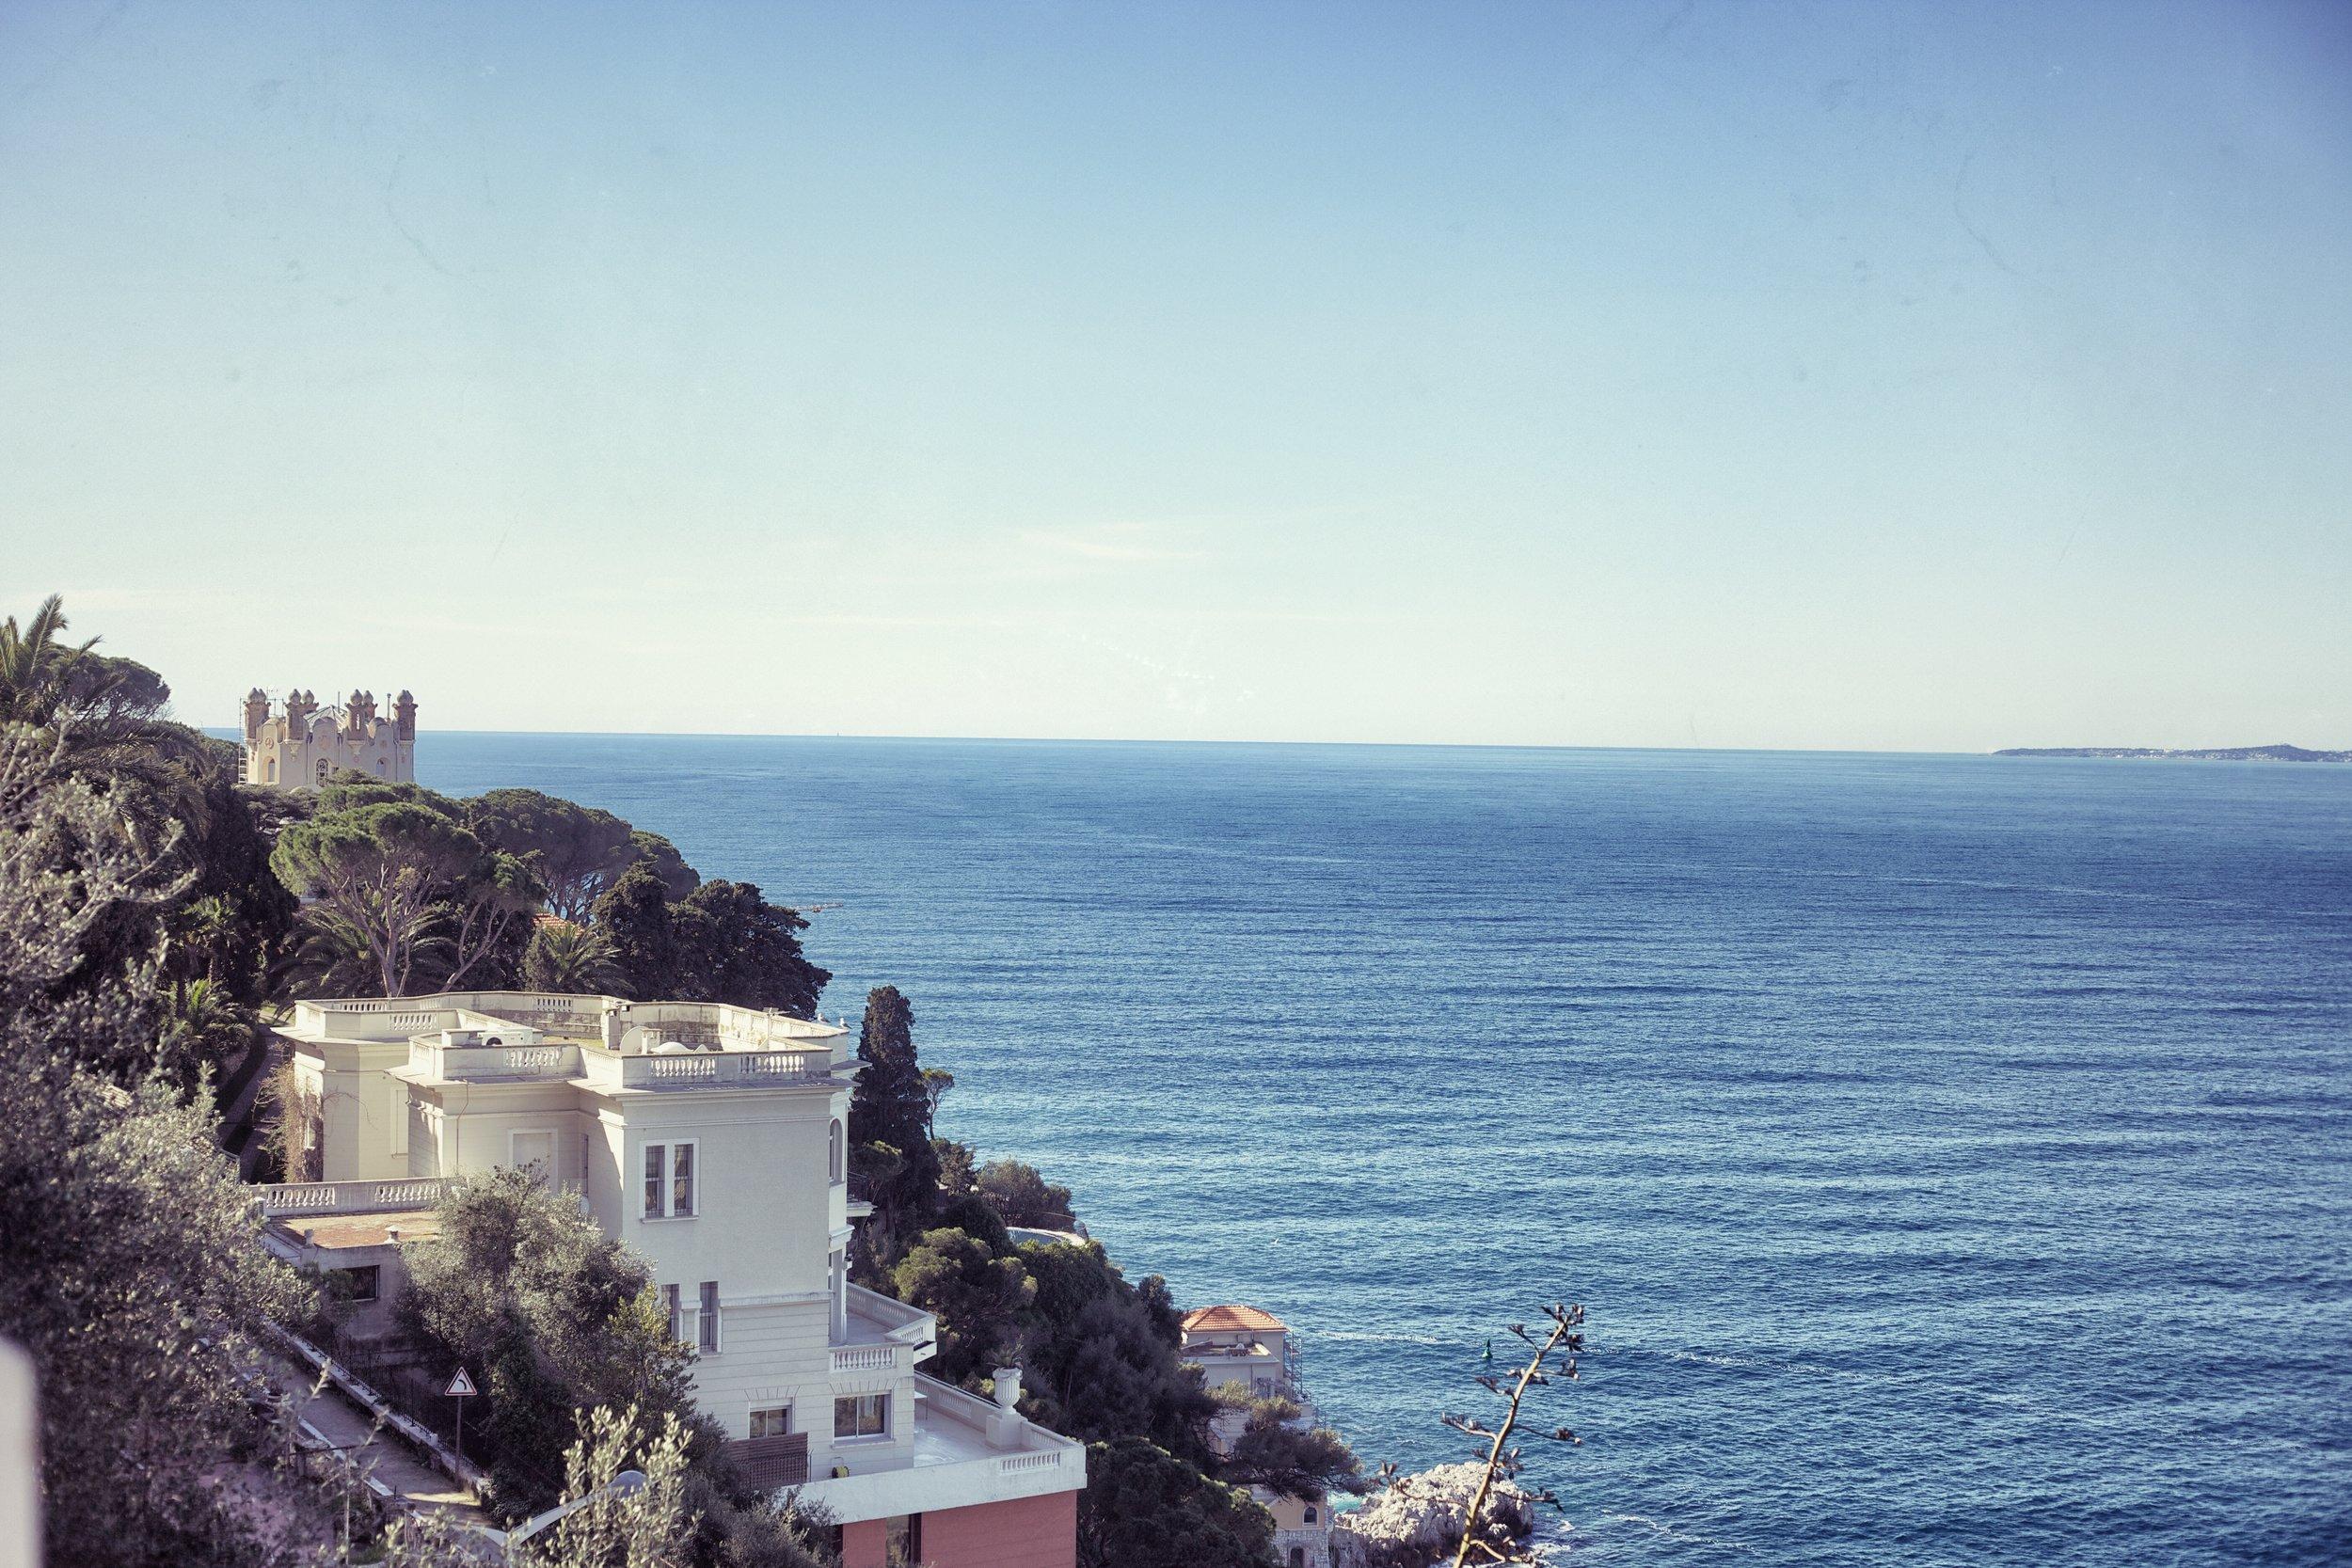 View+of+houses+overlooking+the+ocean.jpg